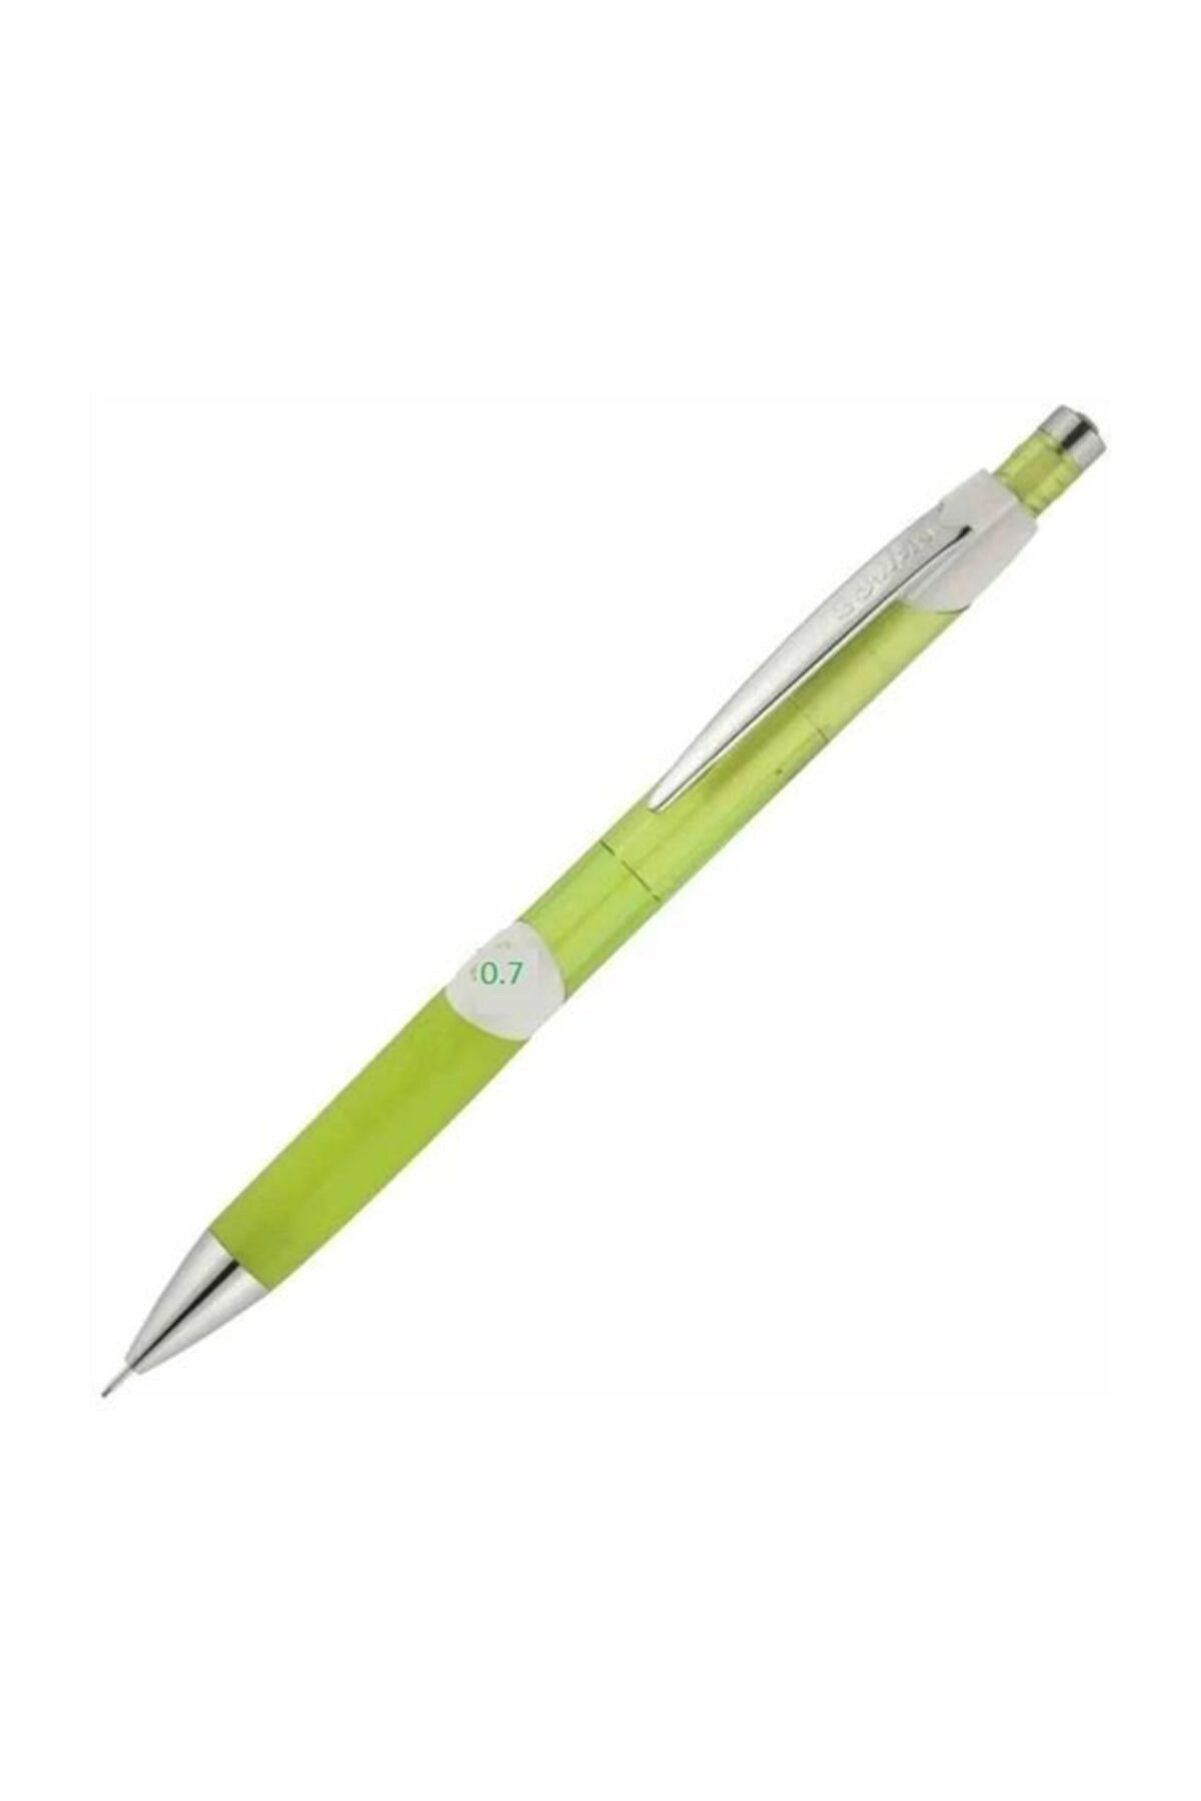 Scrikss Ergo Uçlu Kalem 0.7 - Yeşil